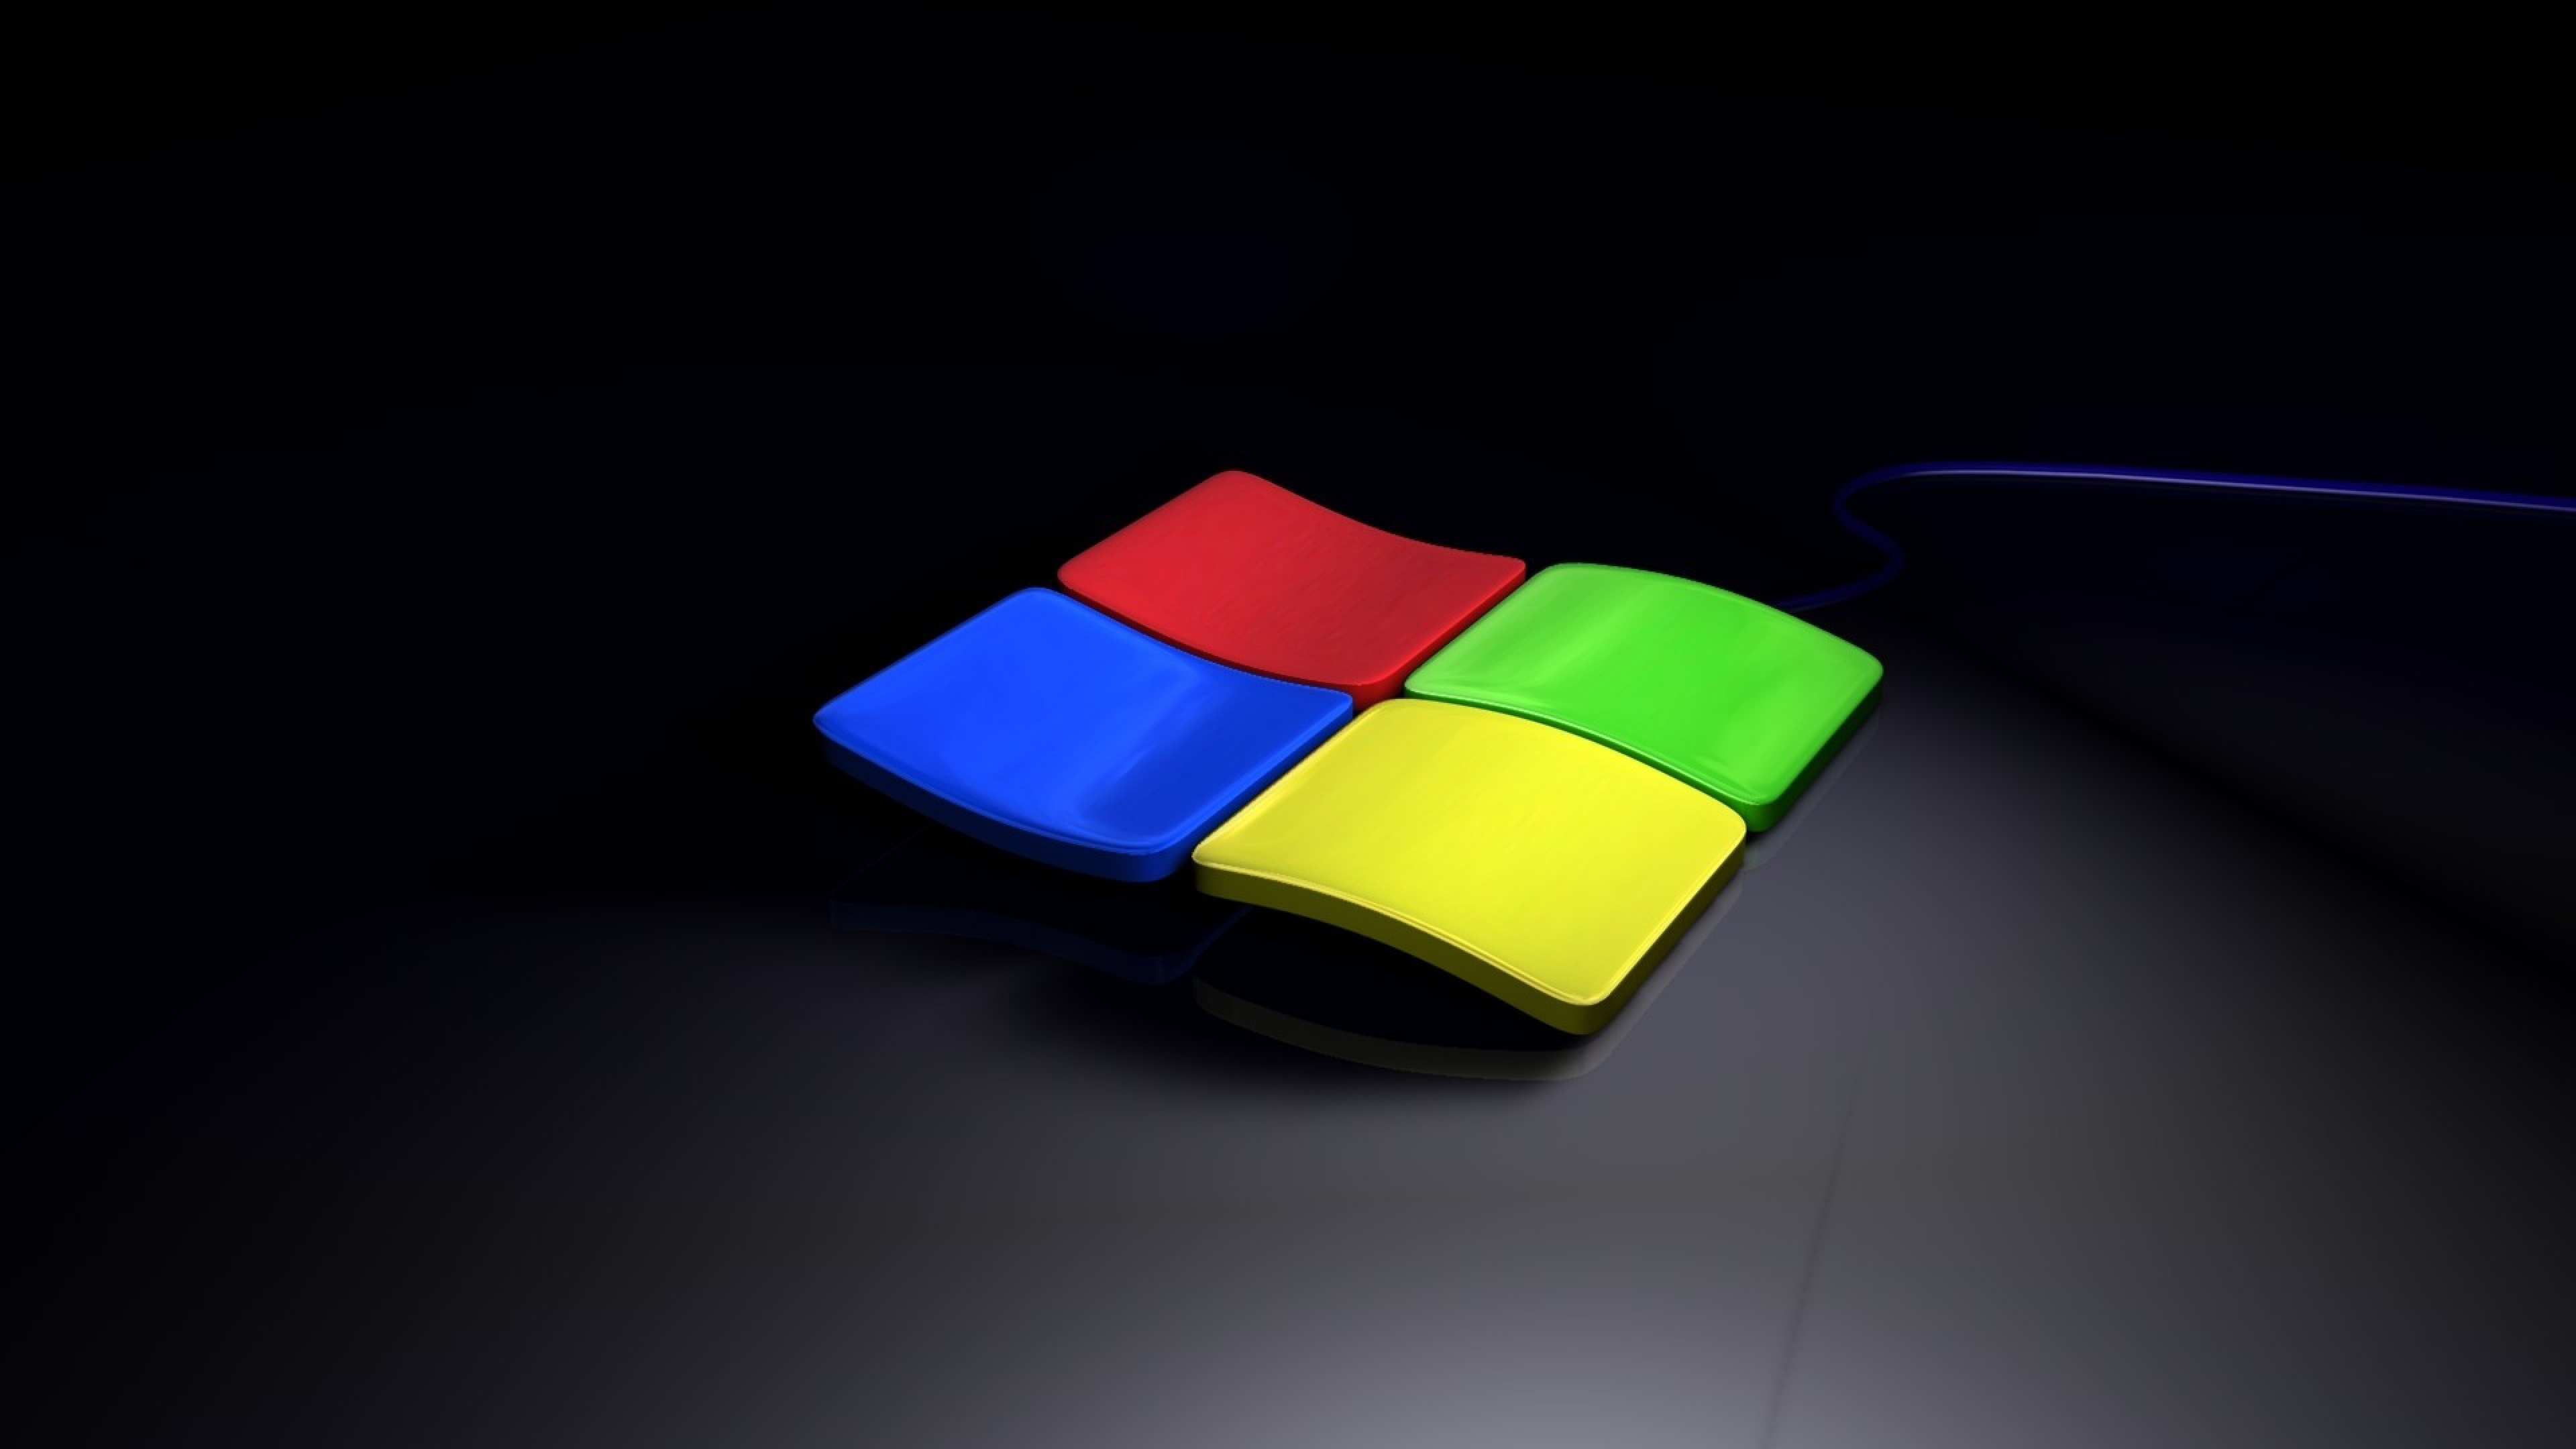 4K Windows Desktop Wallpaper